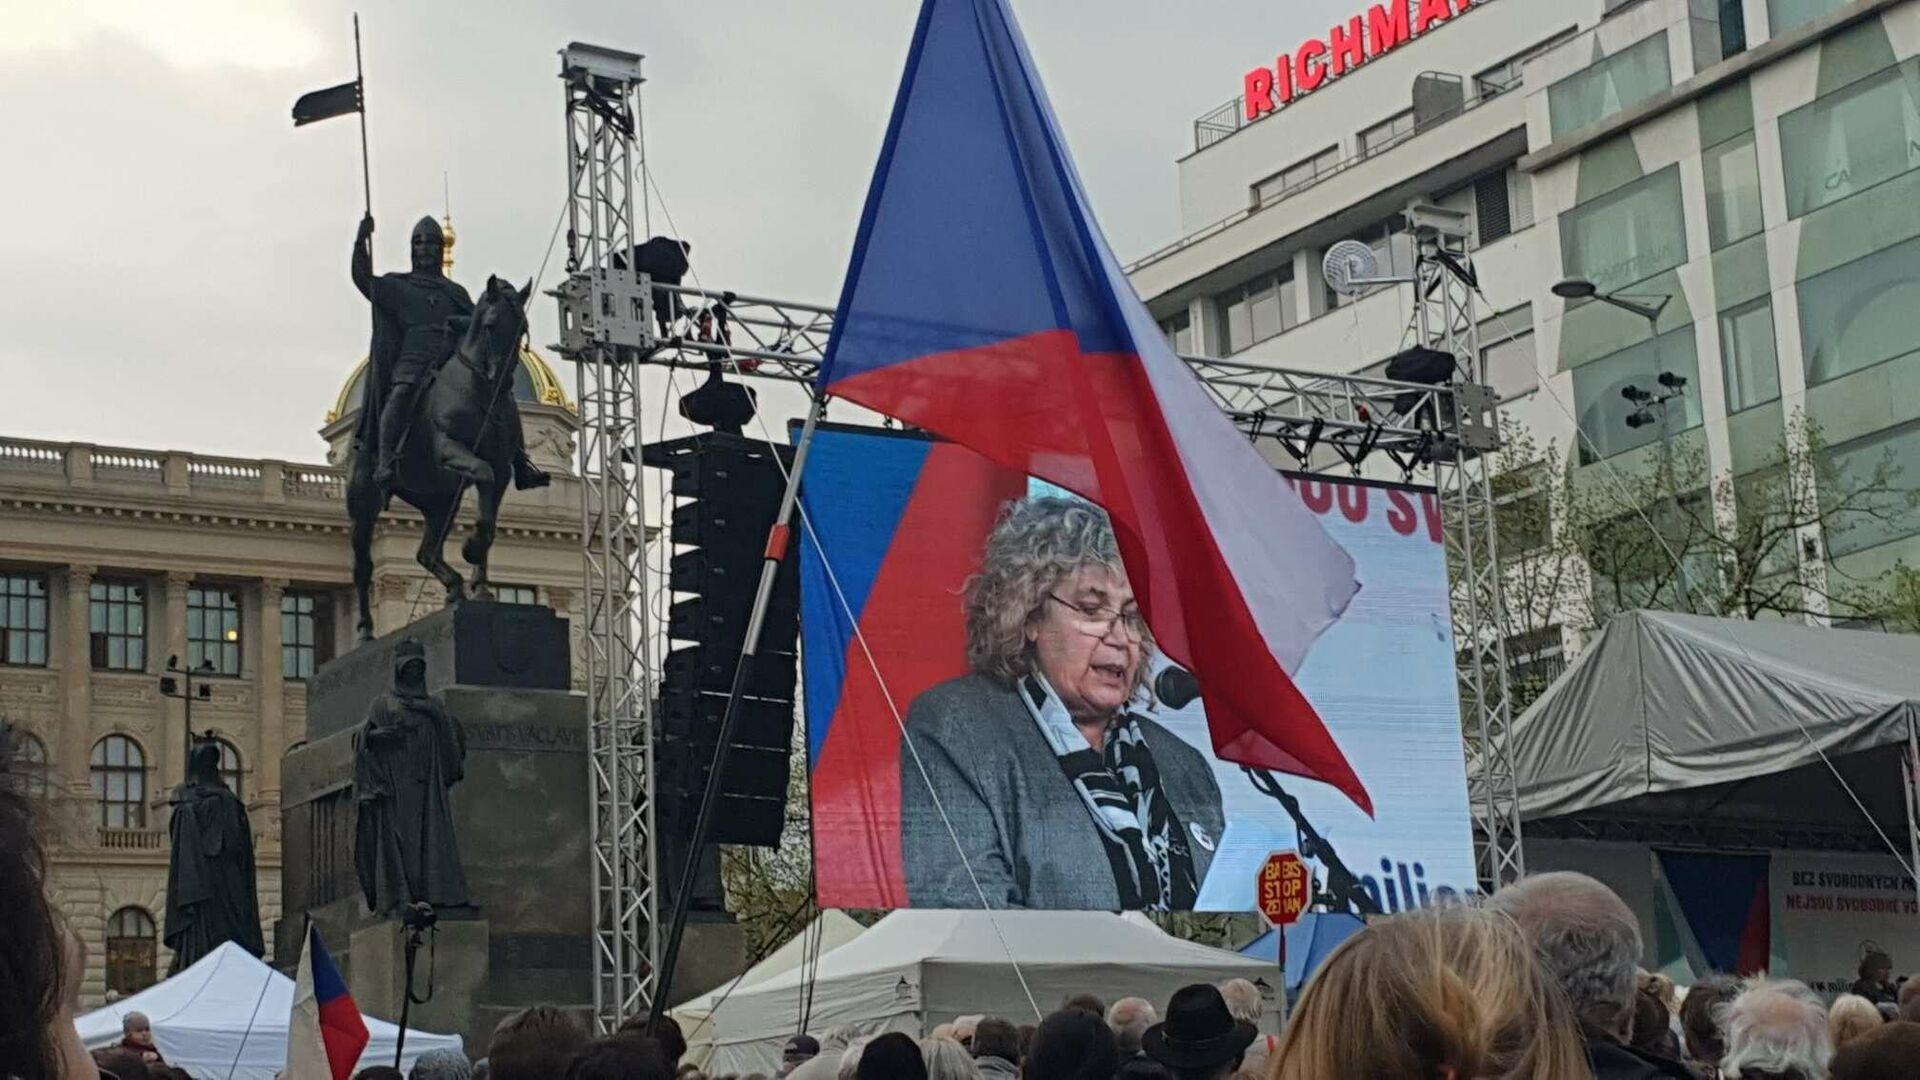 Eugenie Číhalová na sletu Chvilkařů vyslovuje obavu, že Moskvané zaplaví Prahu - Sputnik Česká republika, 1920, 29.04.2021